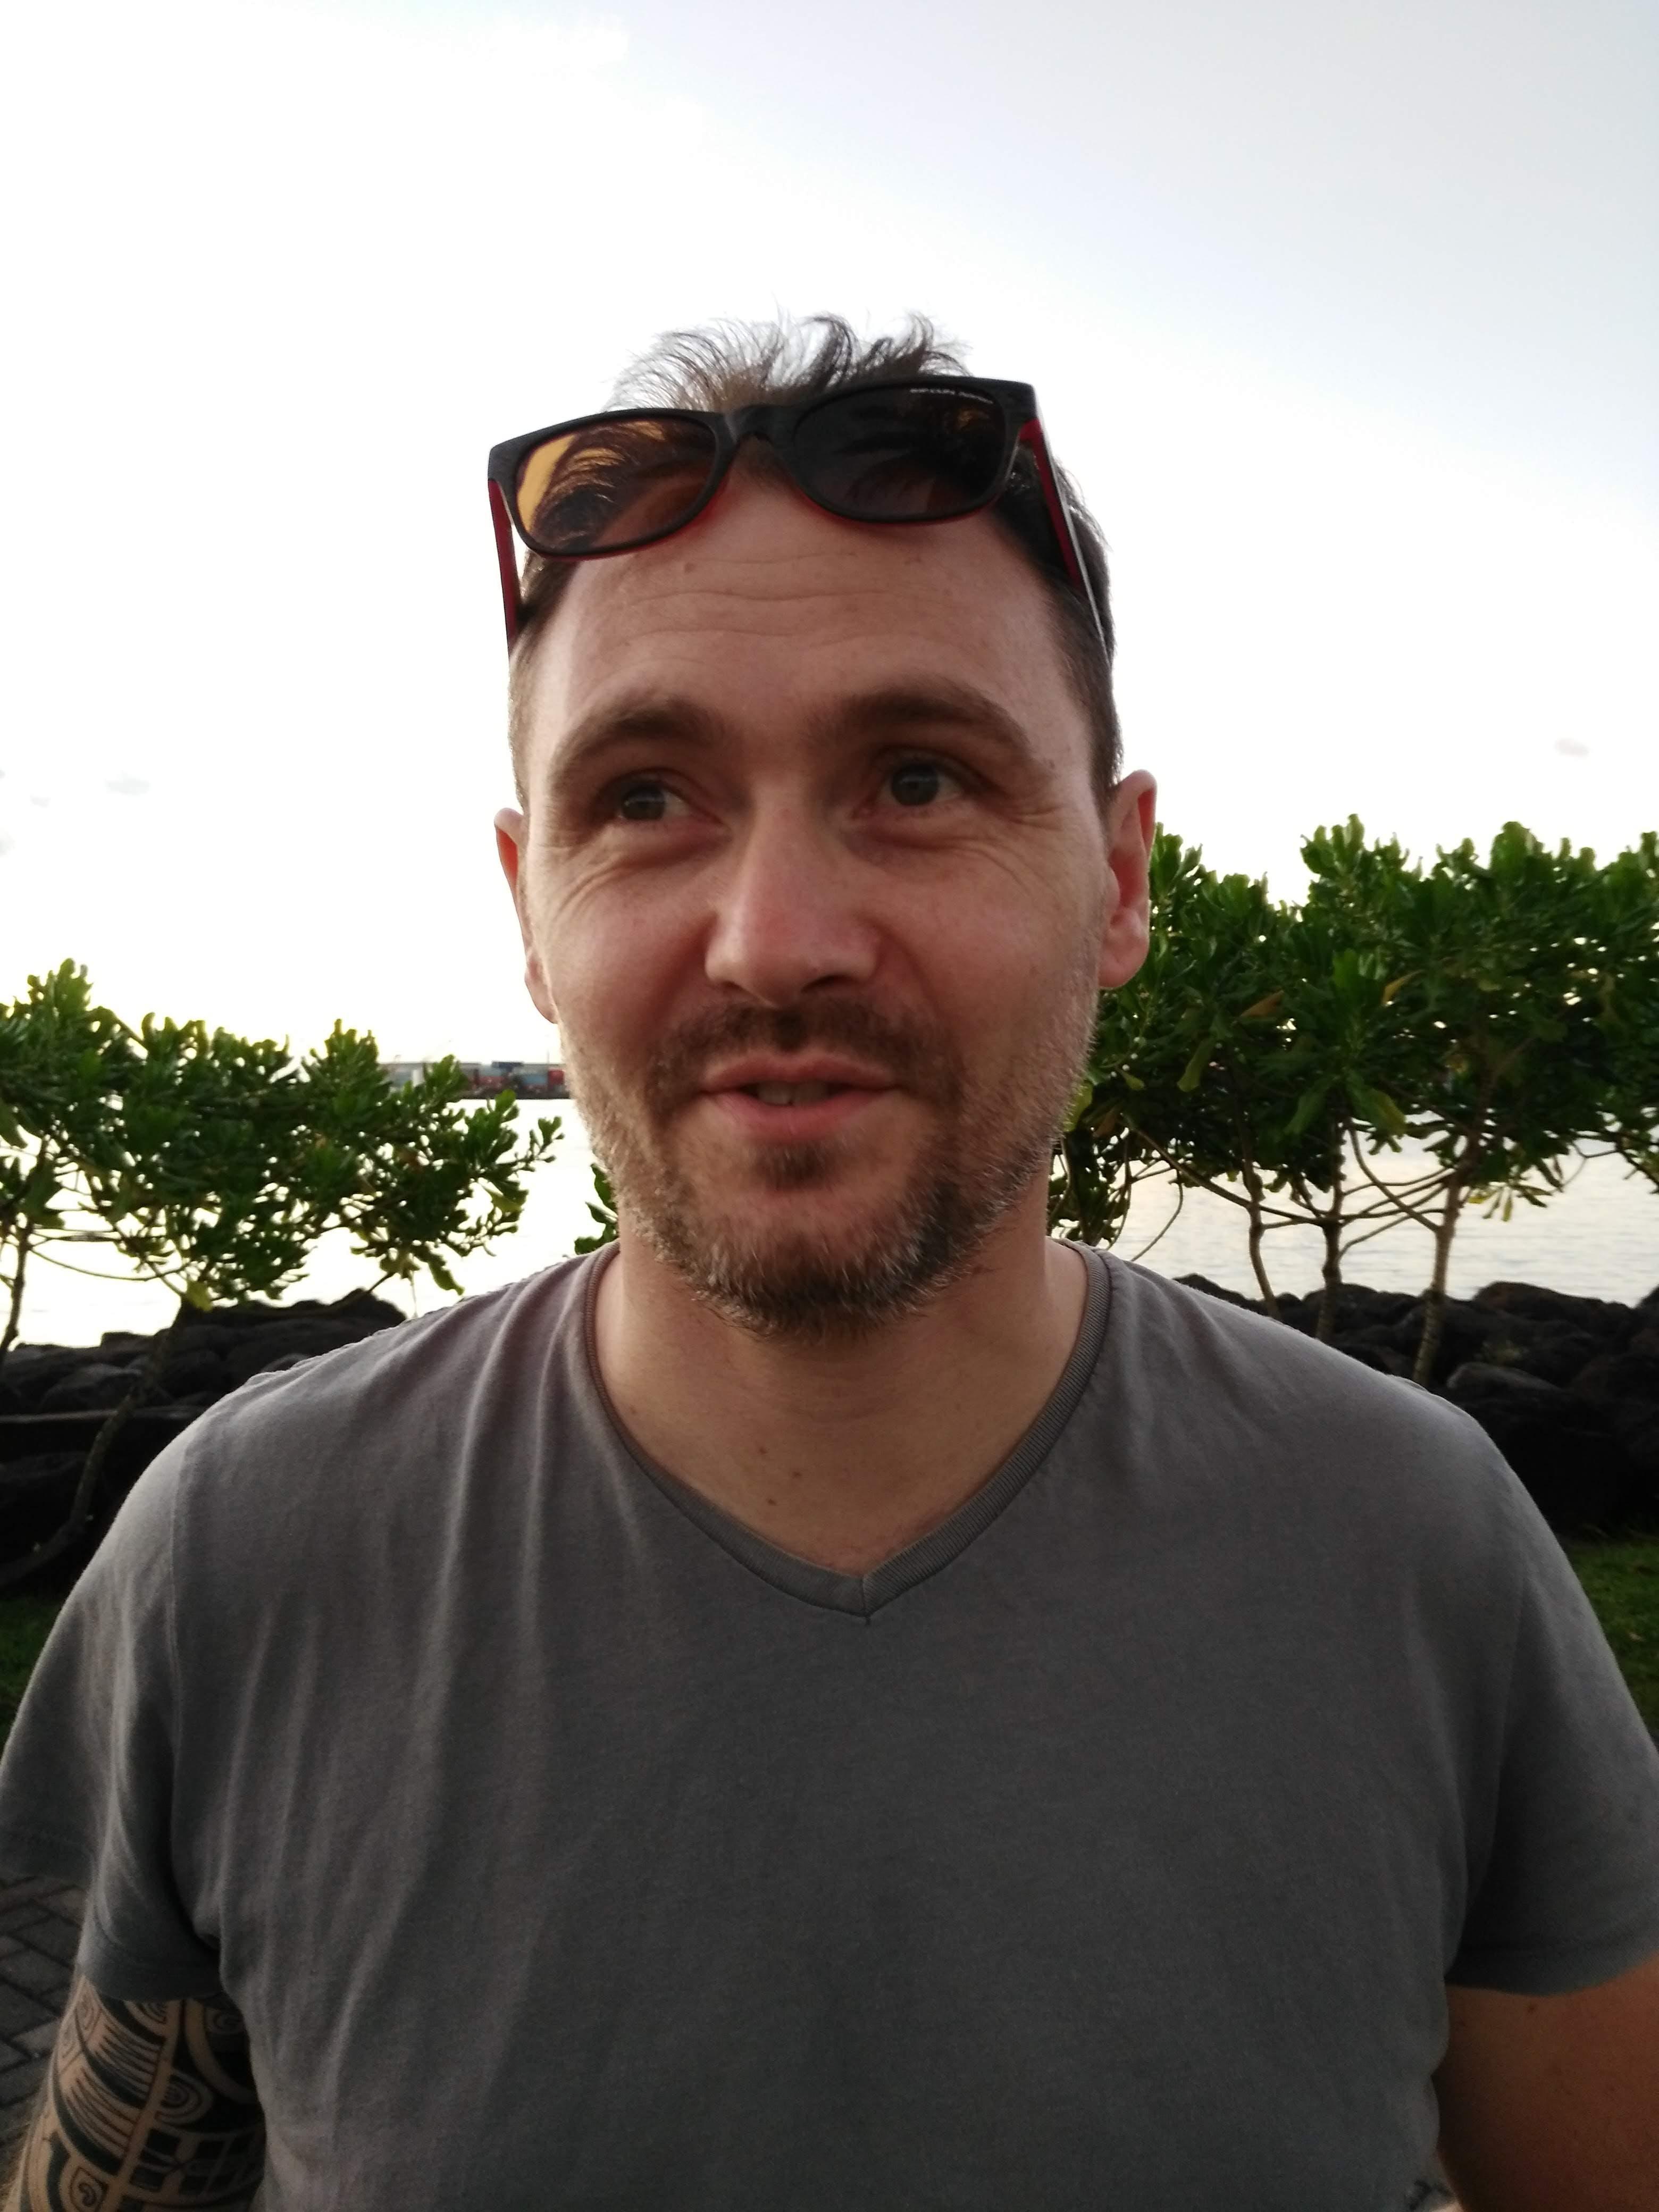 Stéphane Lasmartres